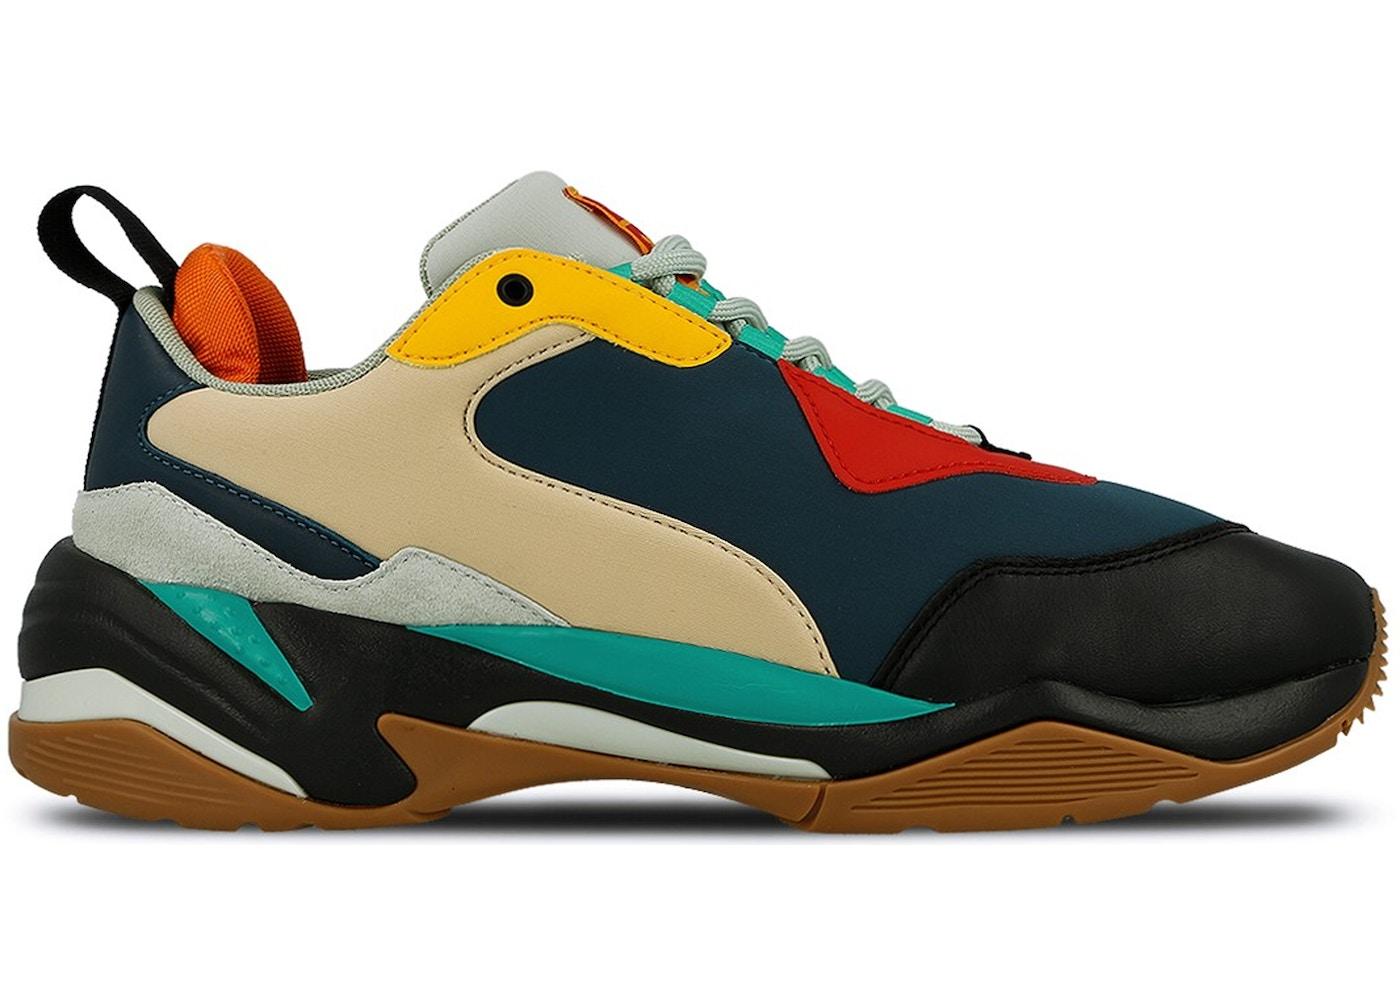 8690a4b584a Puma Size 9 Shoes - Average Sale Price